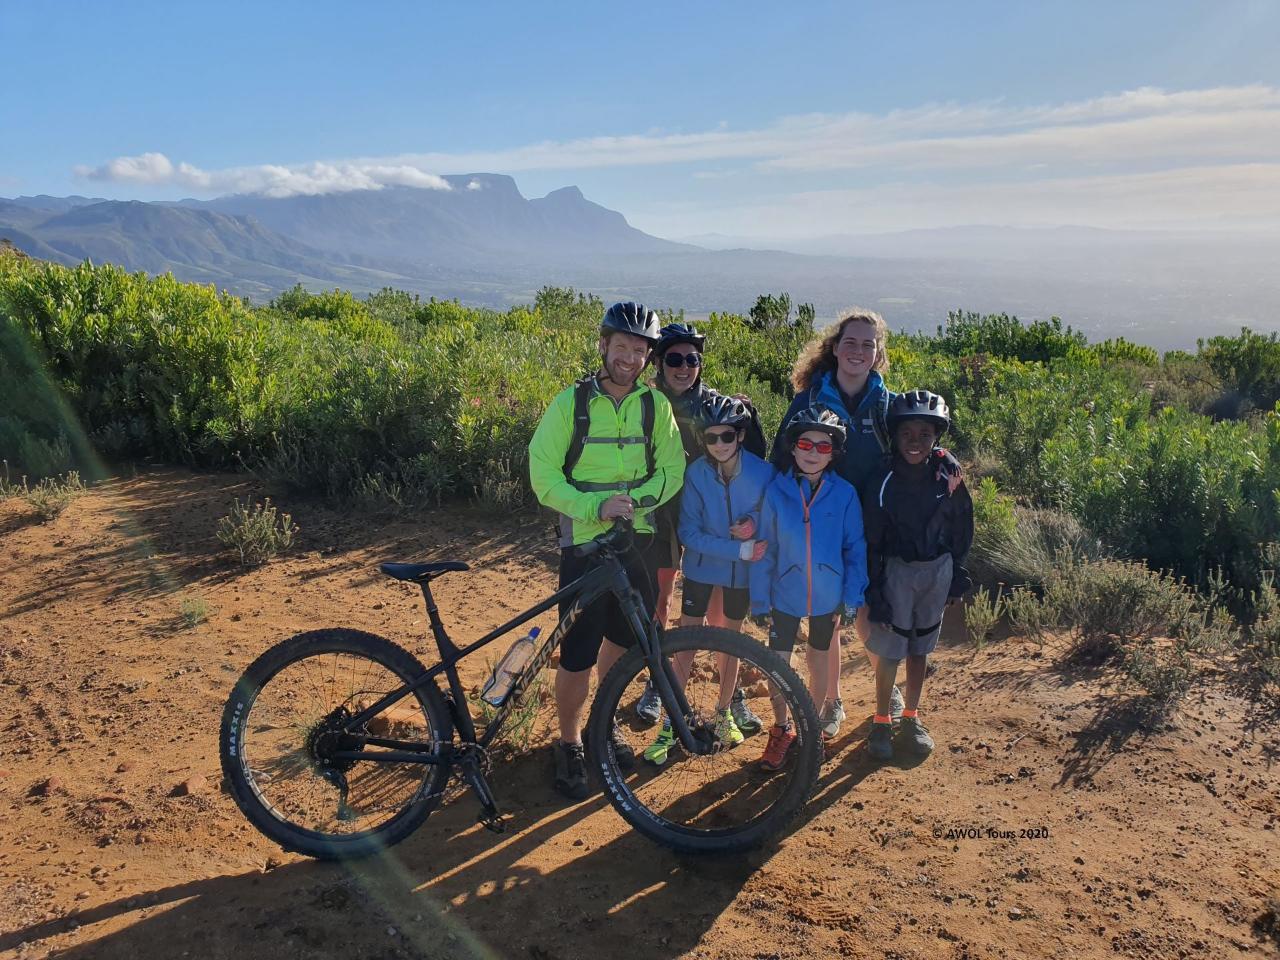 Educational mountain biking skills clinics for kids